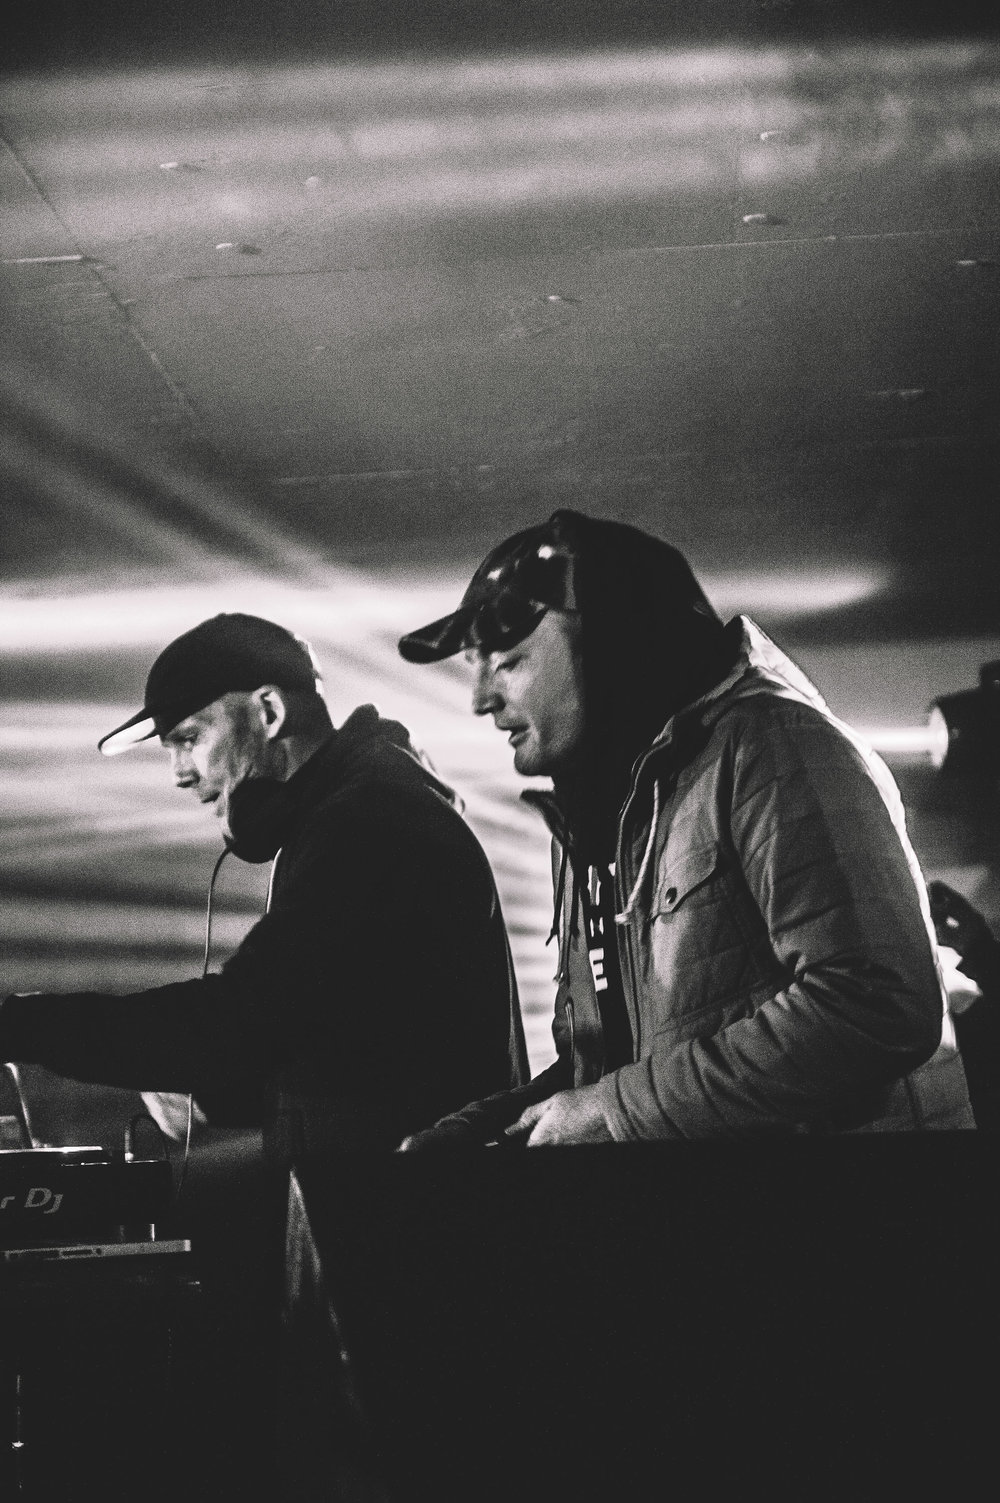 6_Smalltown_DJs_Snowbombing-Timothy_Nguyen-20170409 (10 of 12).jpg